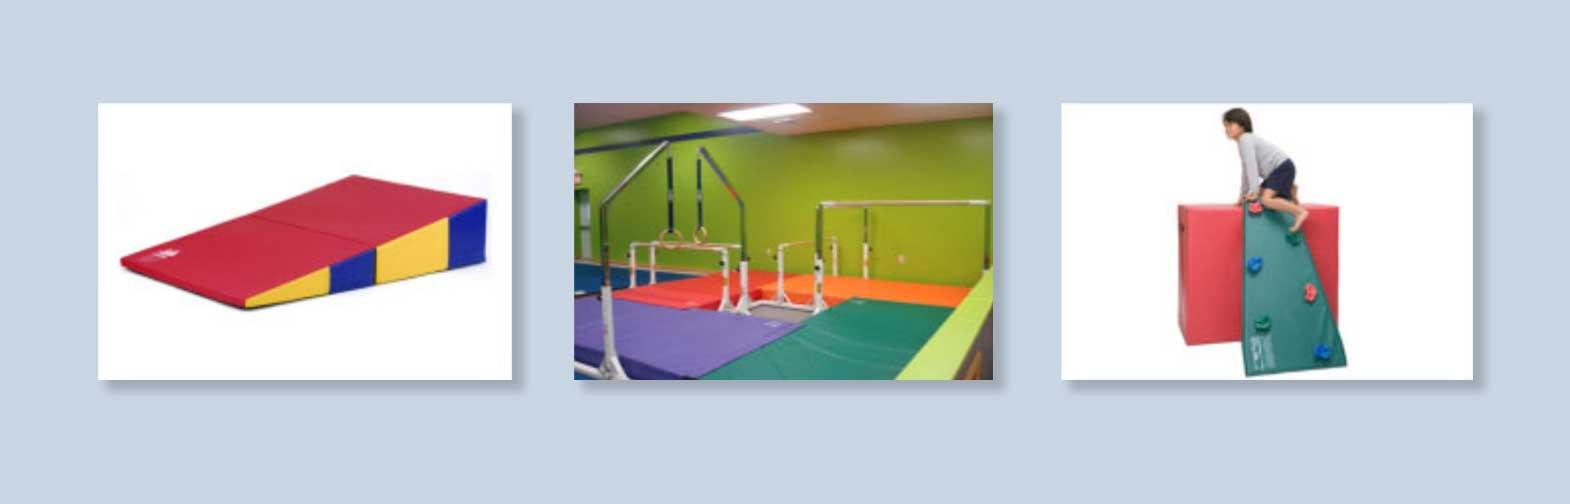 Kids, Fundamental, Kindergym. Preschool Gymnastics Equipment and Mats